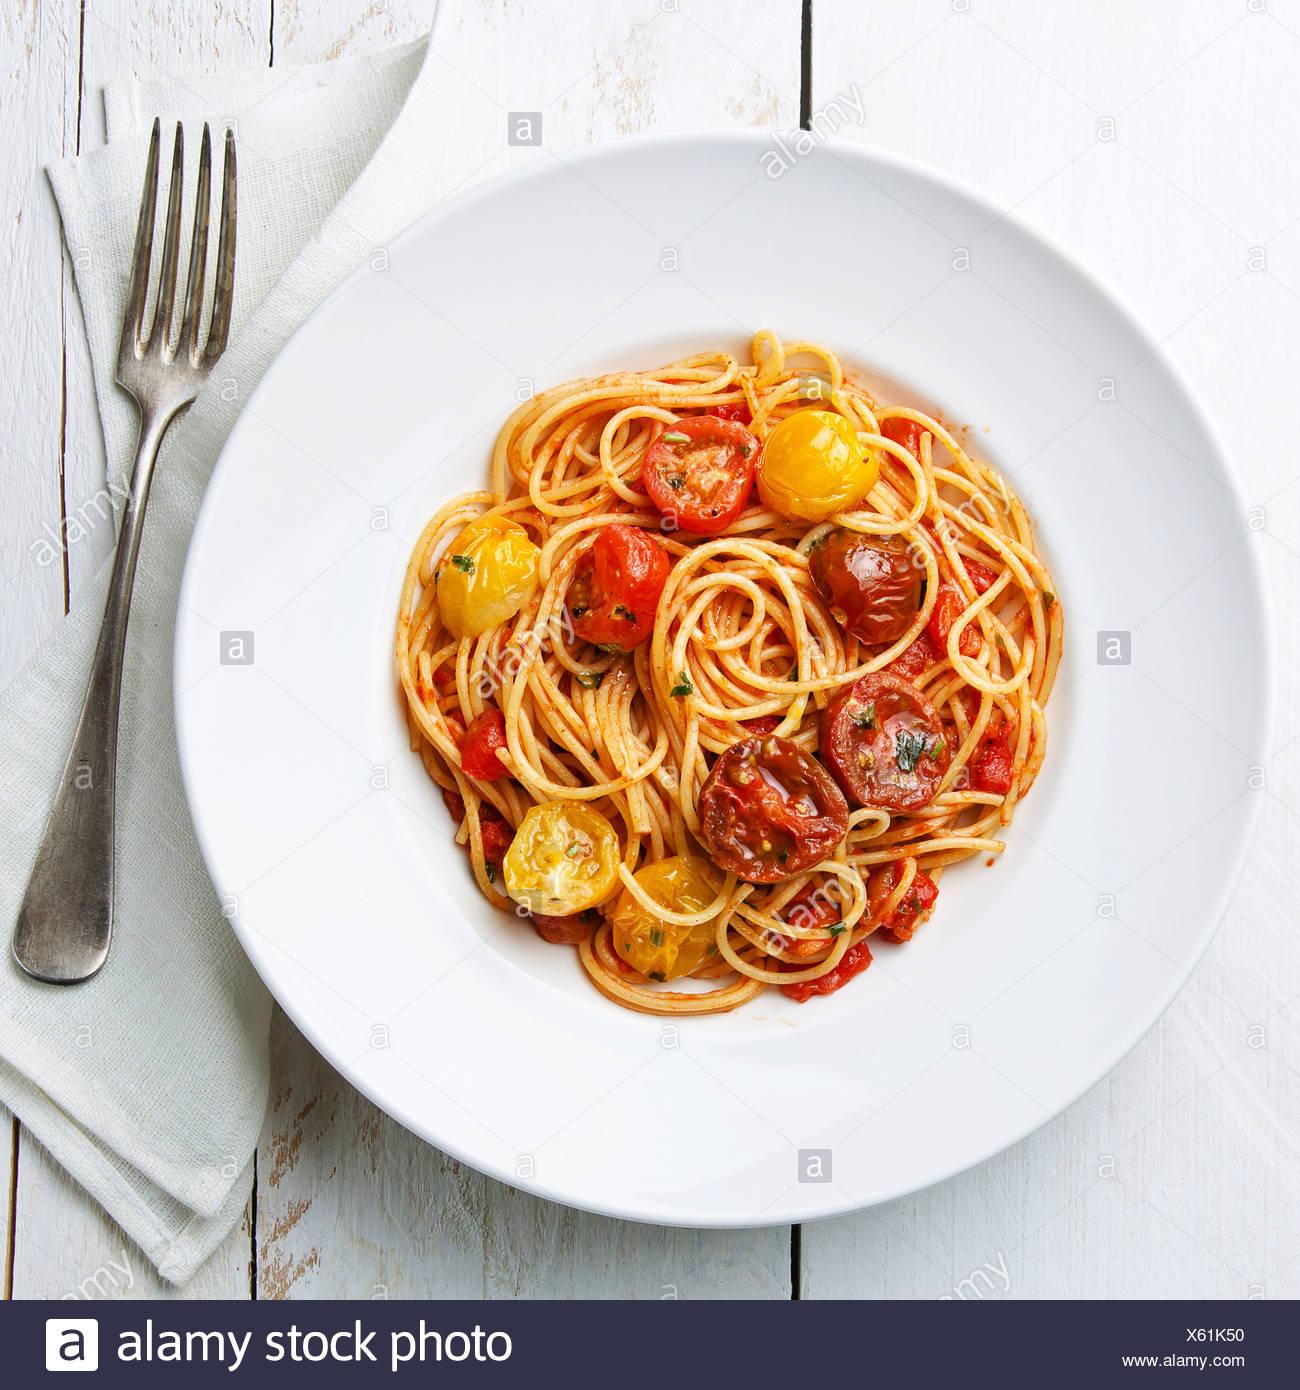 Spaghetti à la sauce tomate sur fond de bois blanc Photo Stock